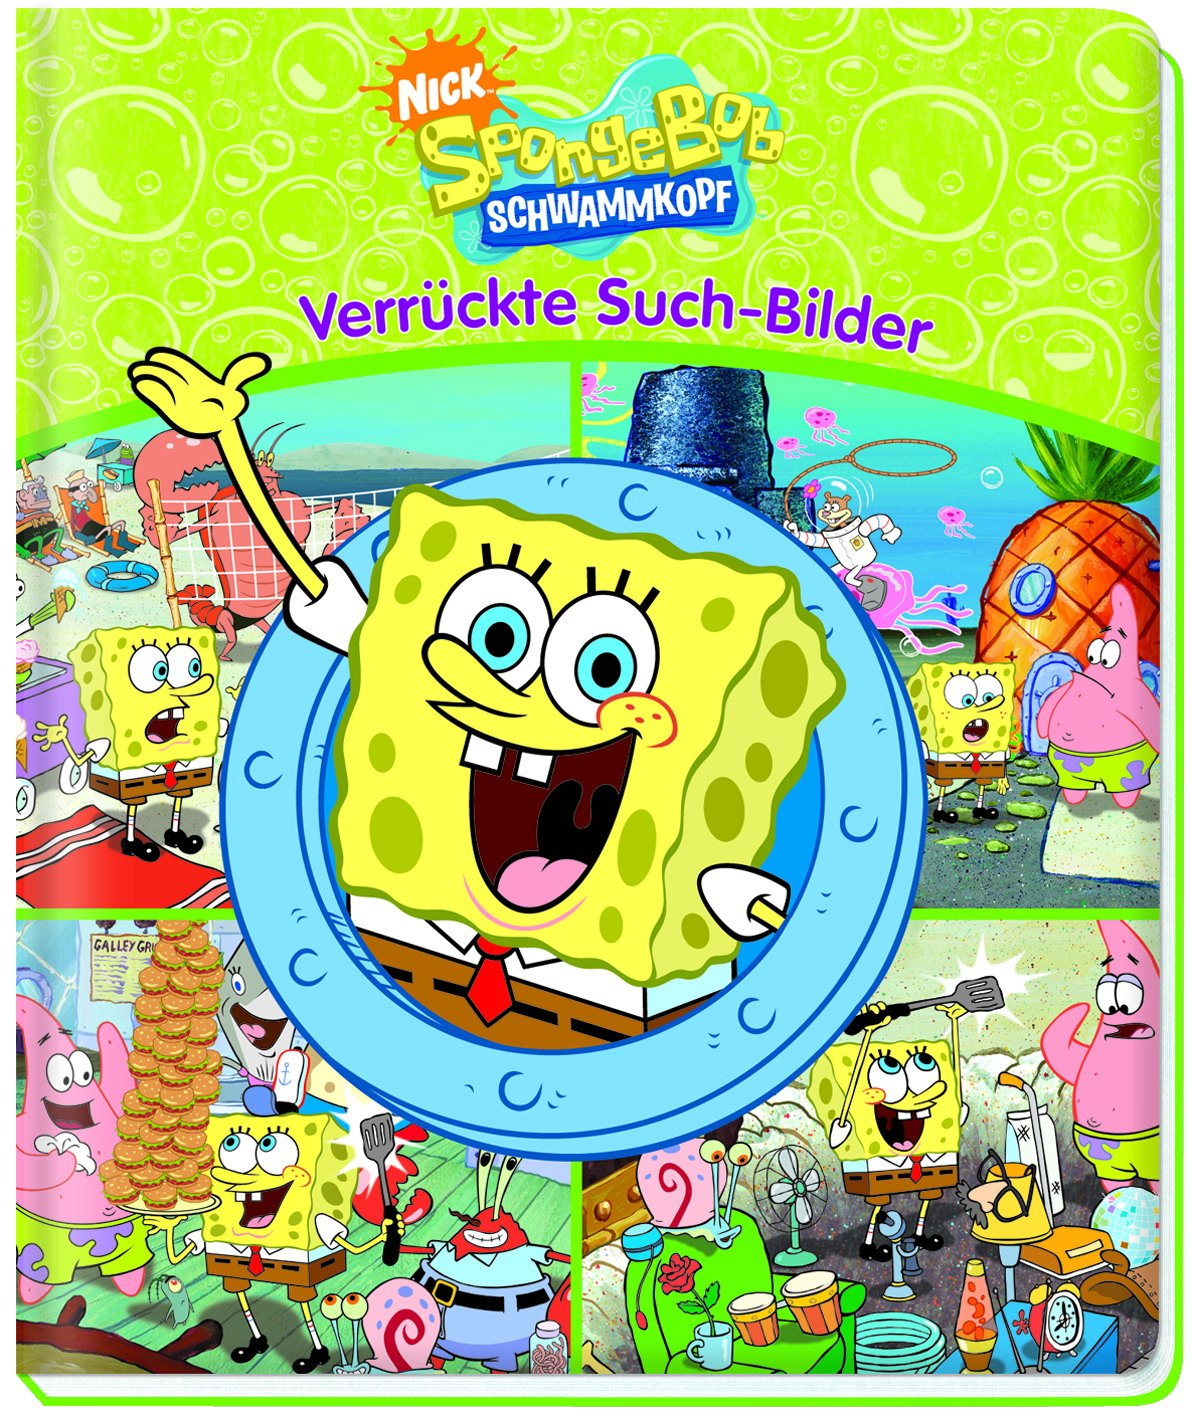 SpongeBob - Verrückte Suchbilder, Wimmelbild